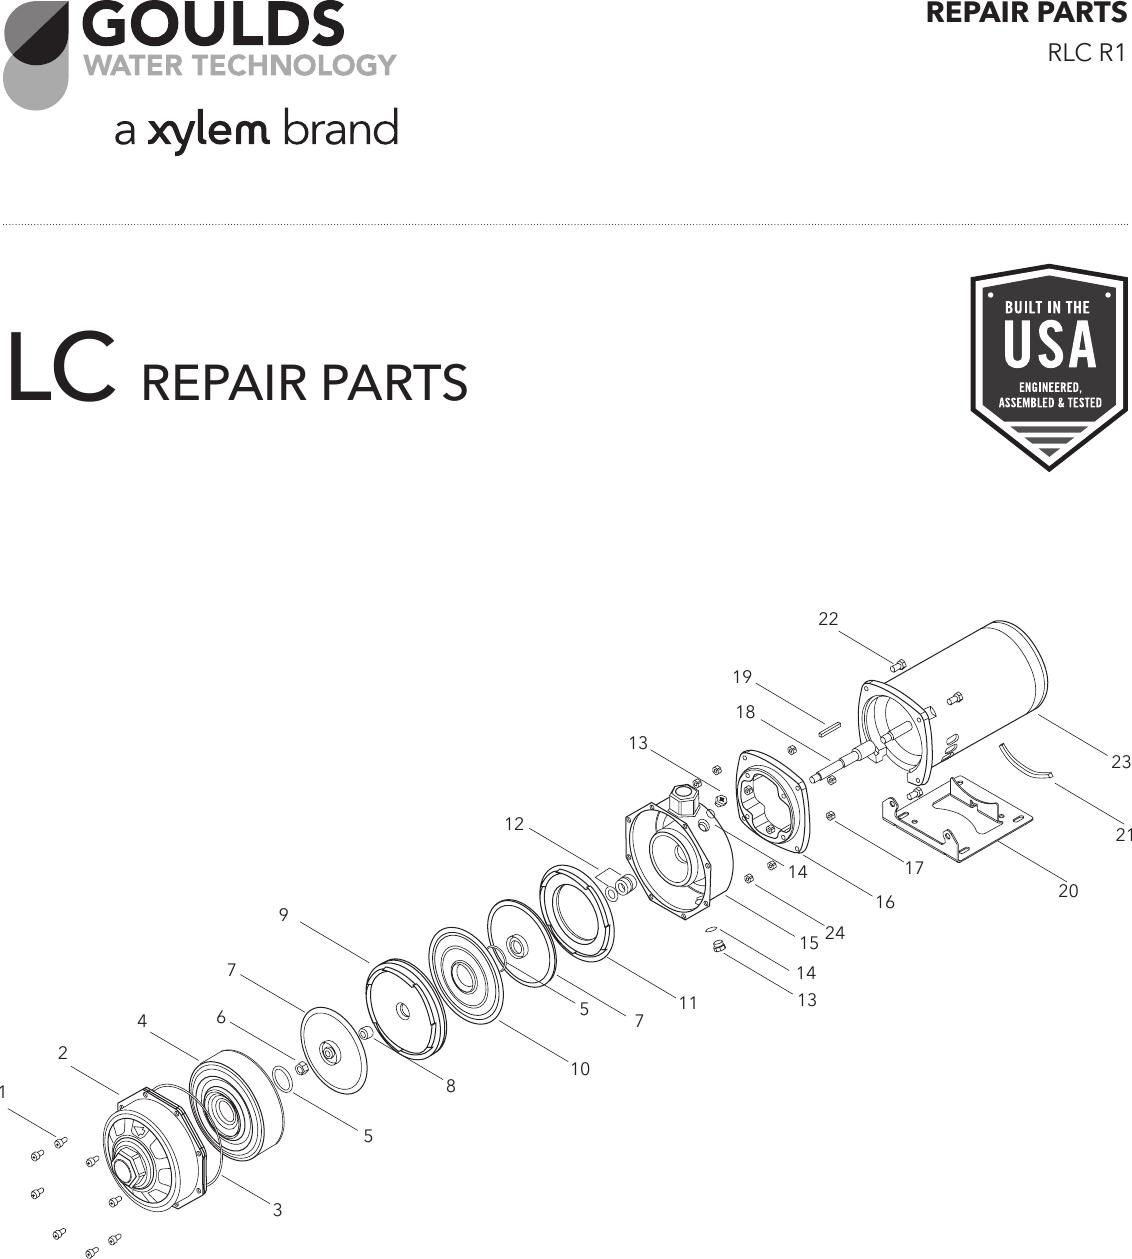 3 goulds lc centrifugal pump repair parts